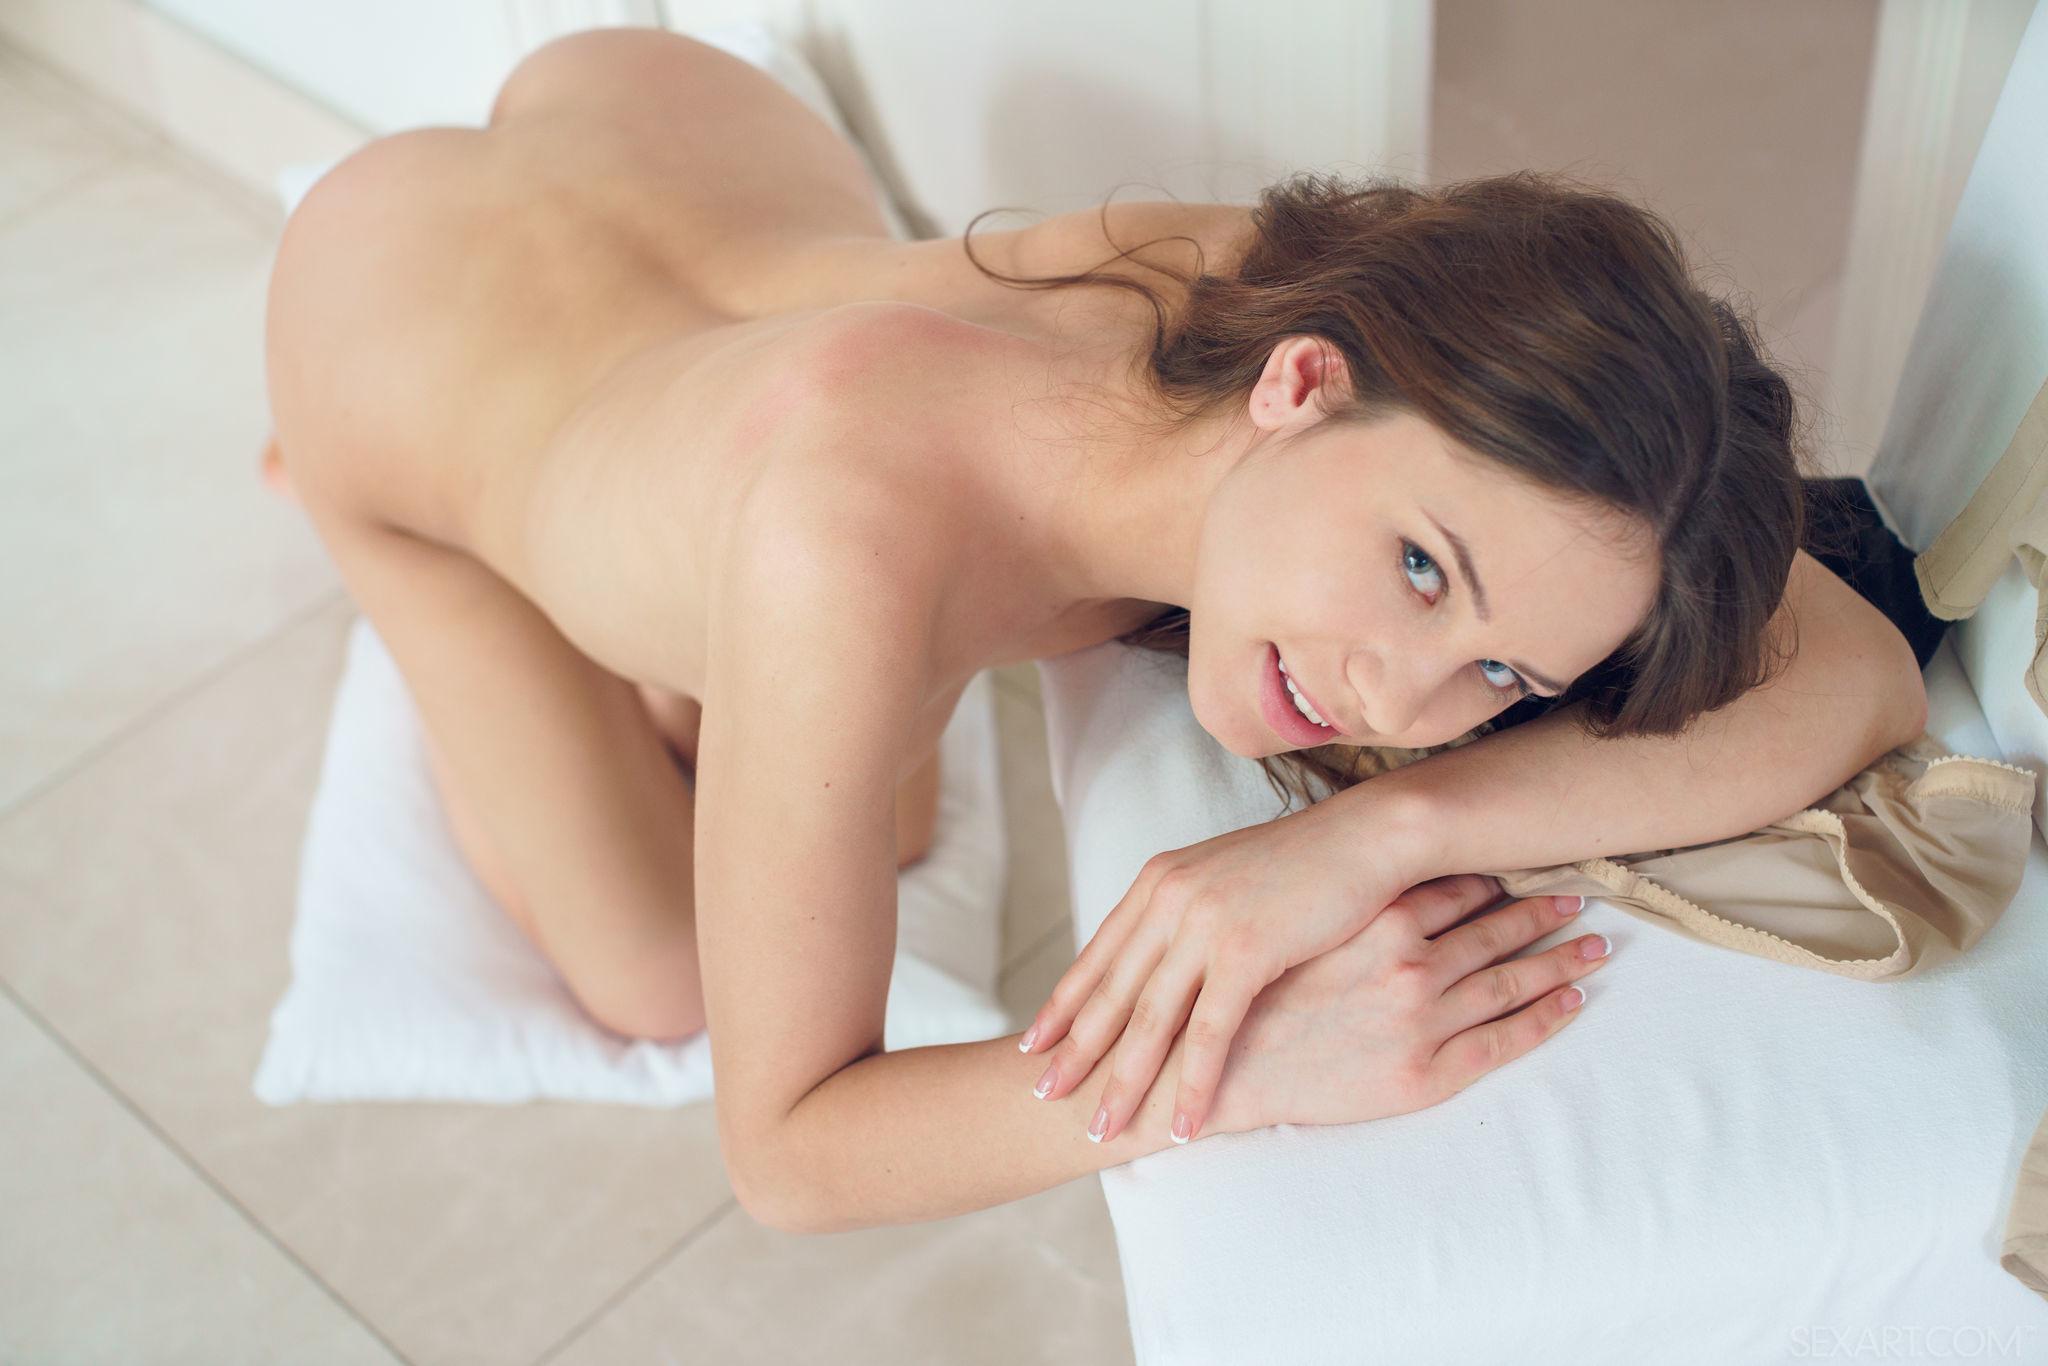 Barbara View Medira Teen Brunette Sensual Nude Posing 608113 Naked Young Babe In Black High Heels